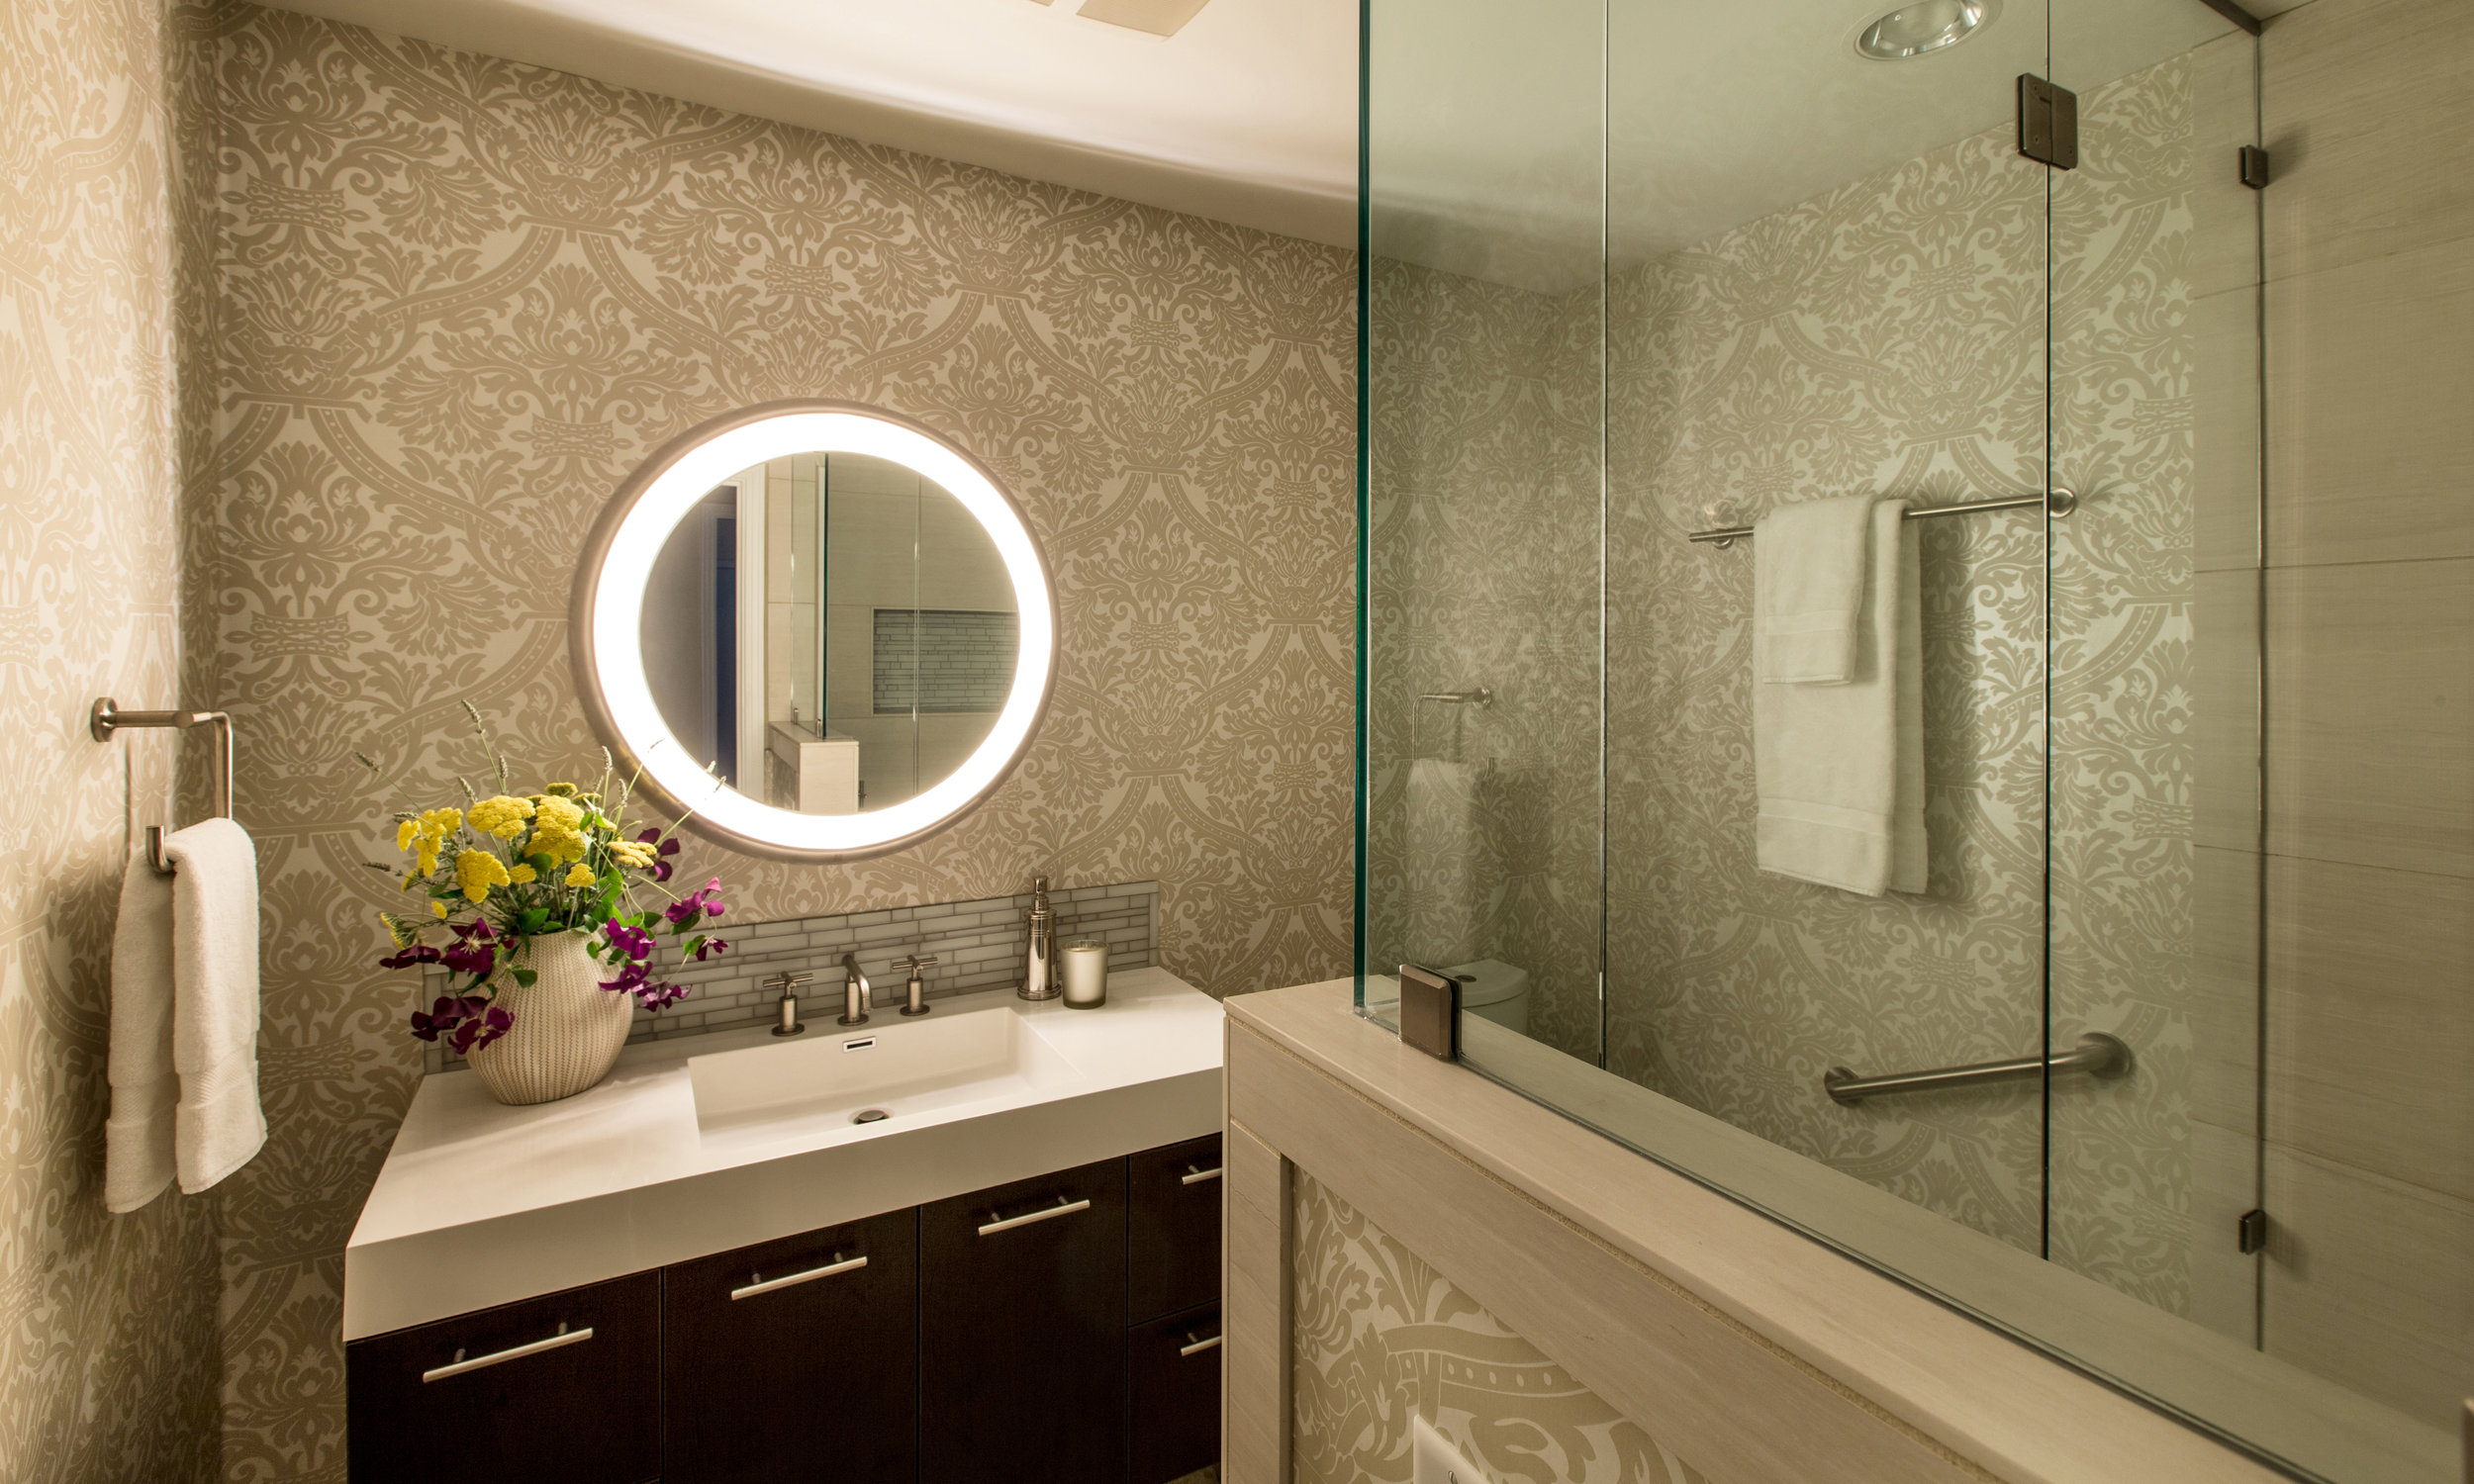 Pheasant-Hill-Guest-Bathroom-Remodel.jpg